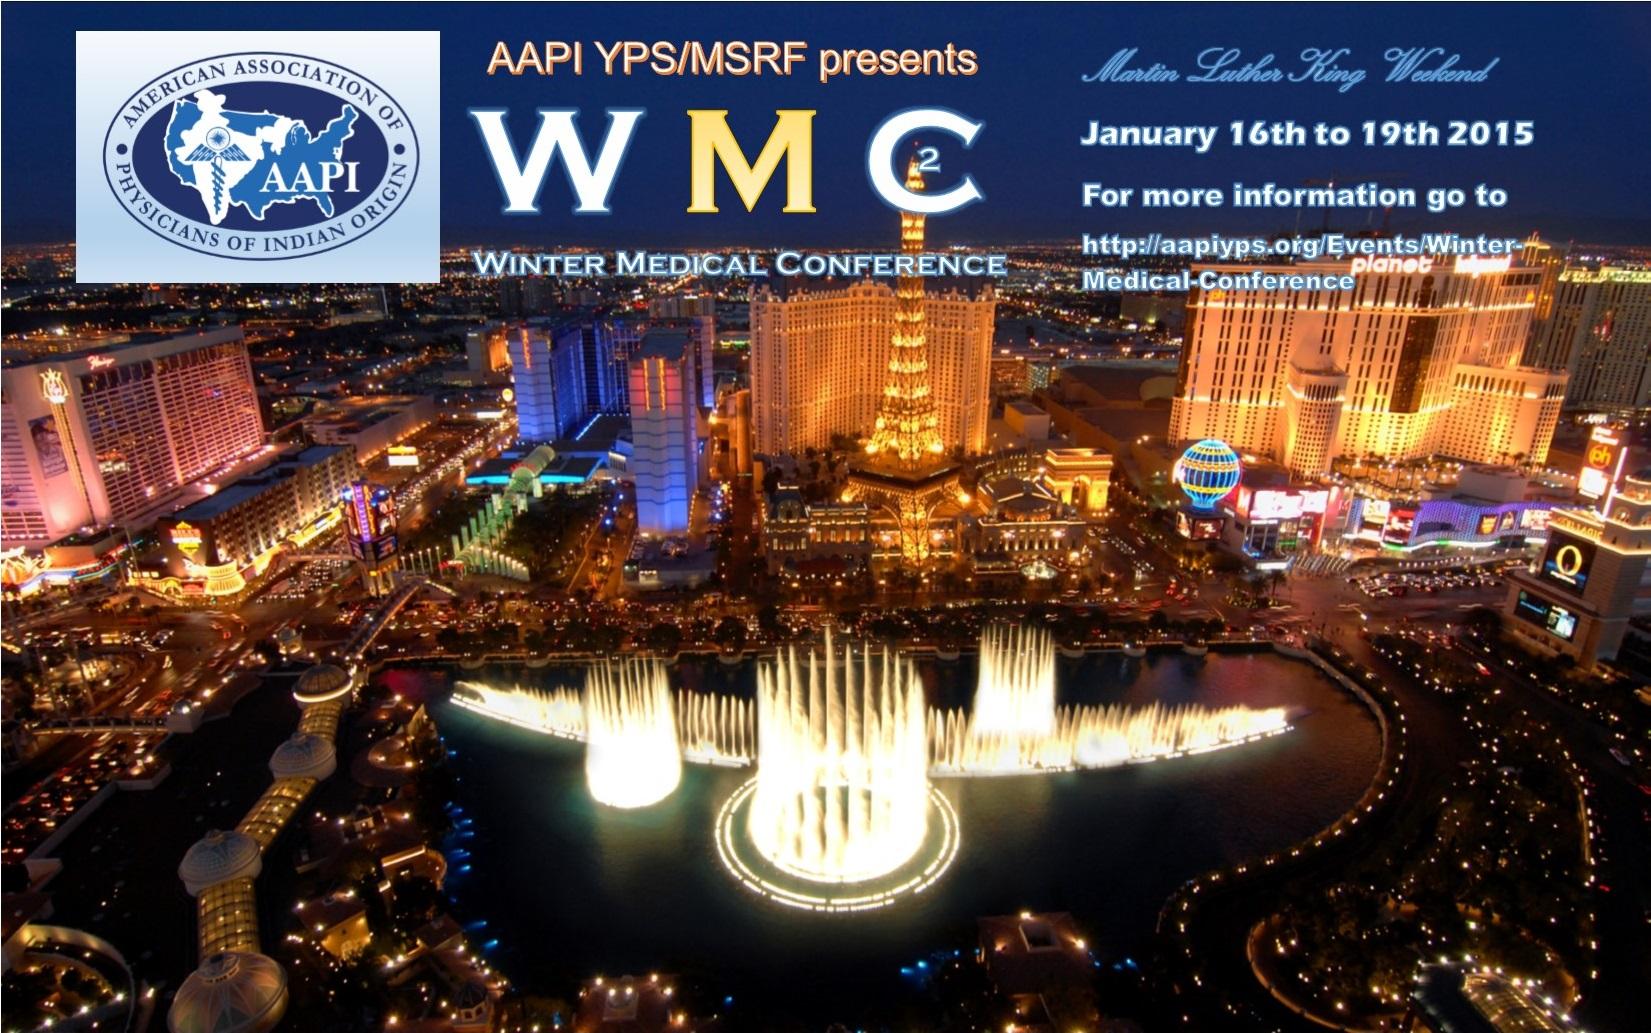 WMC 2 Las Vegas Banner - 11-8-2014